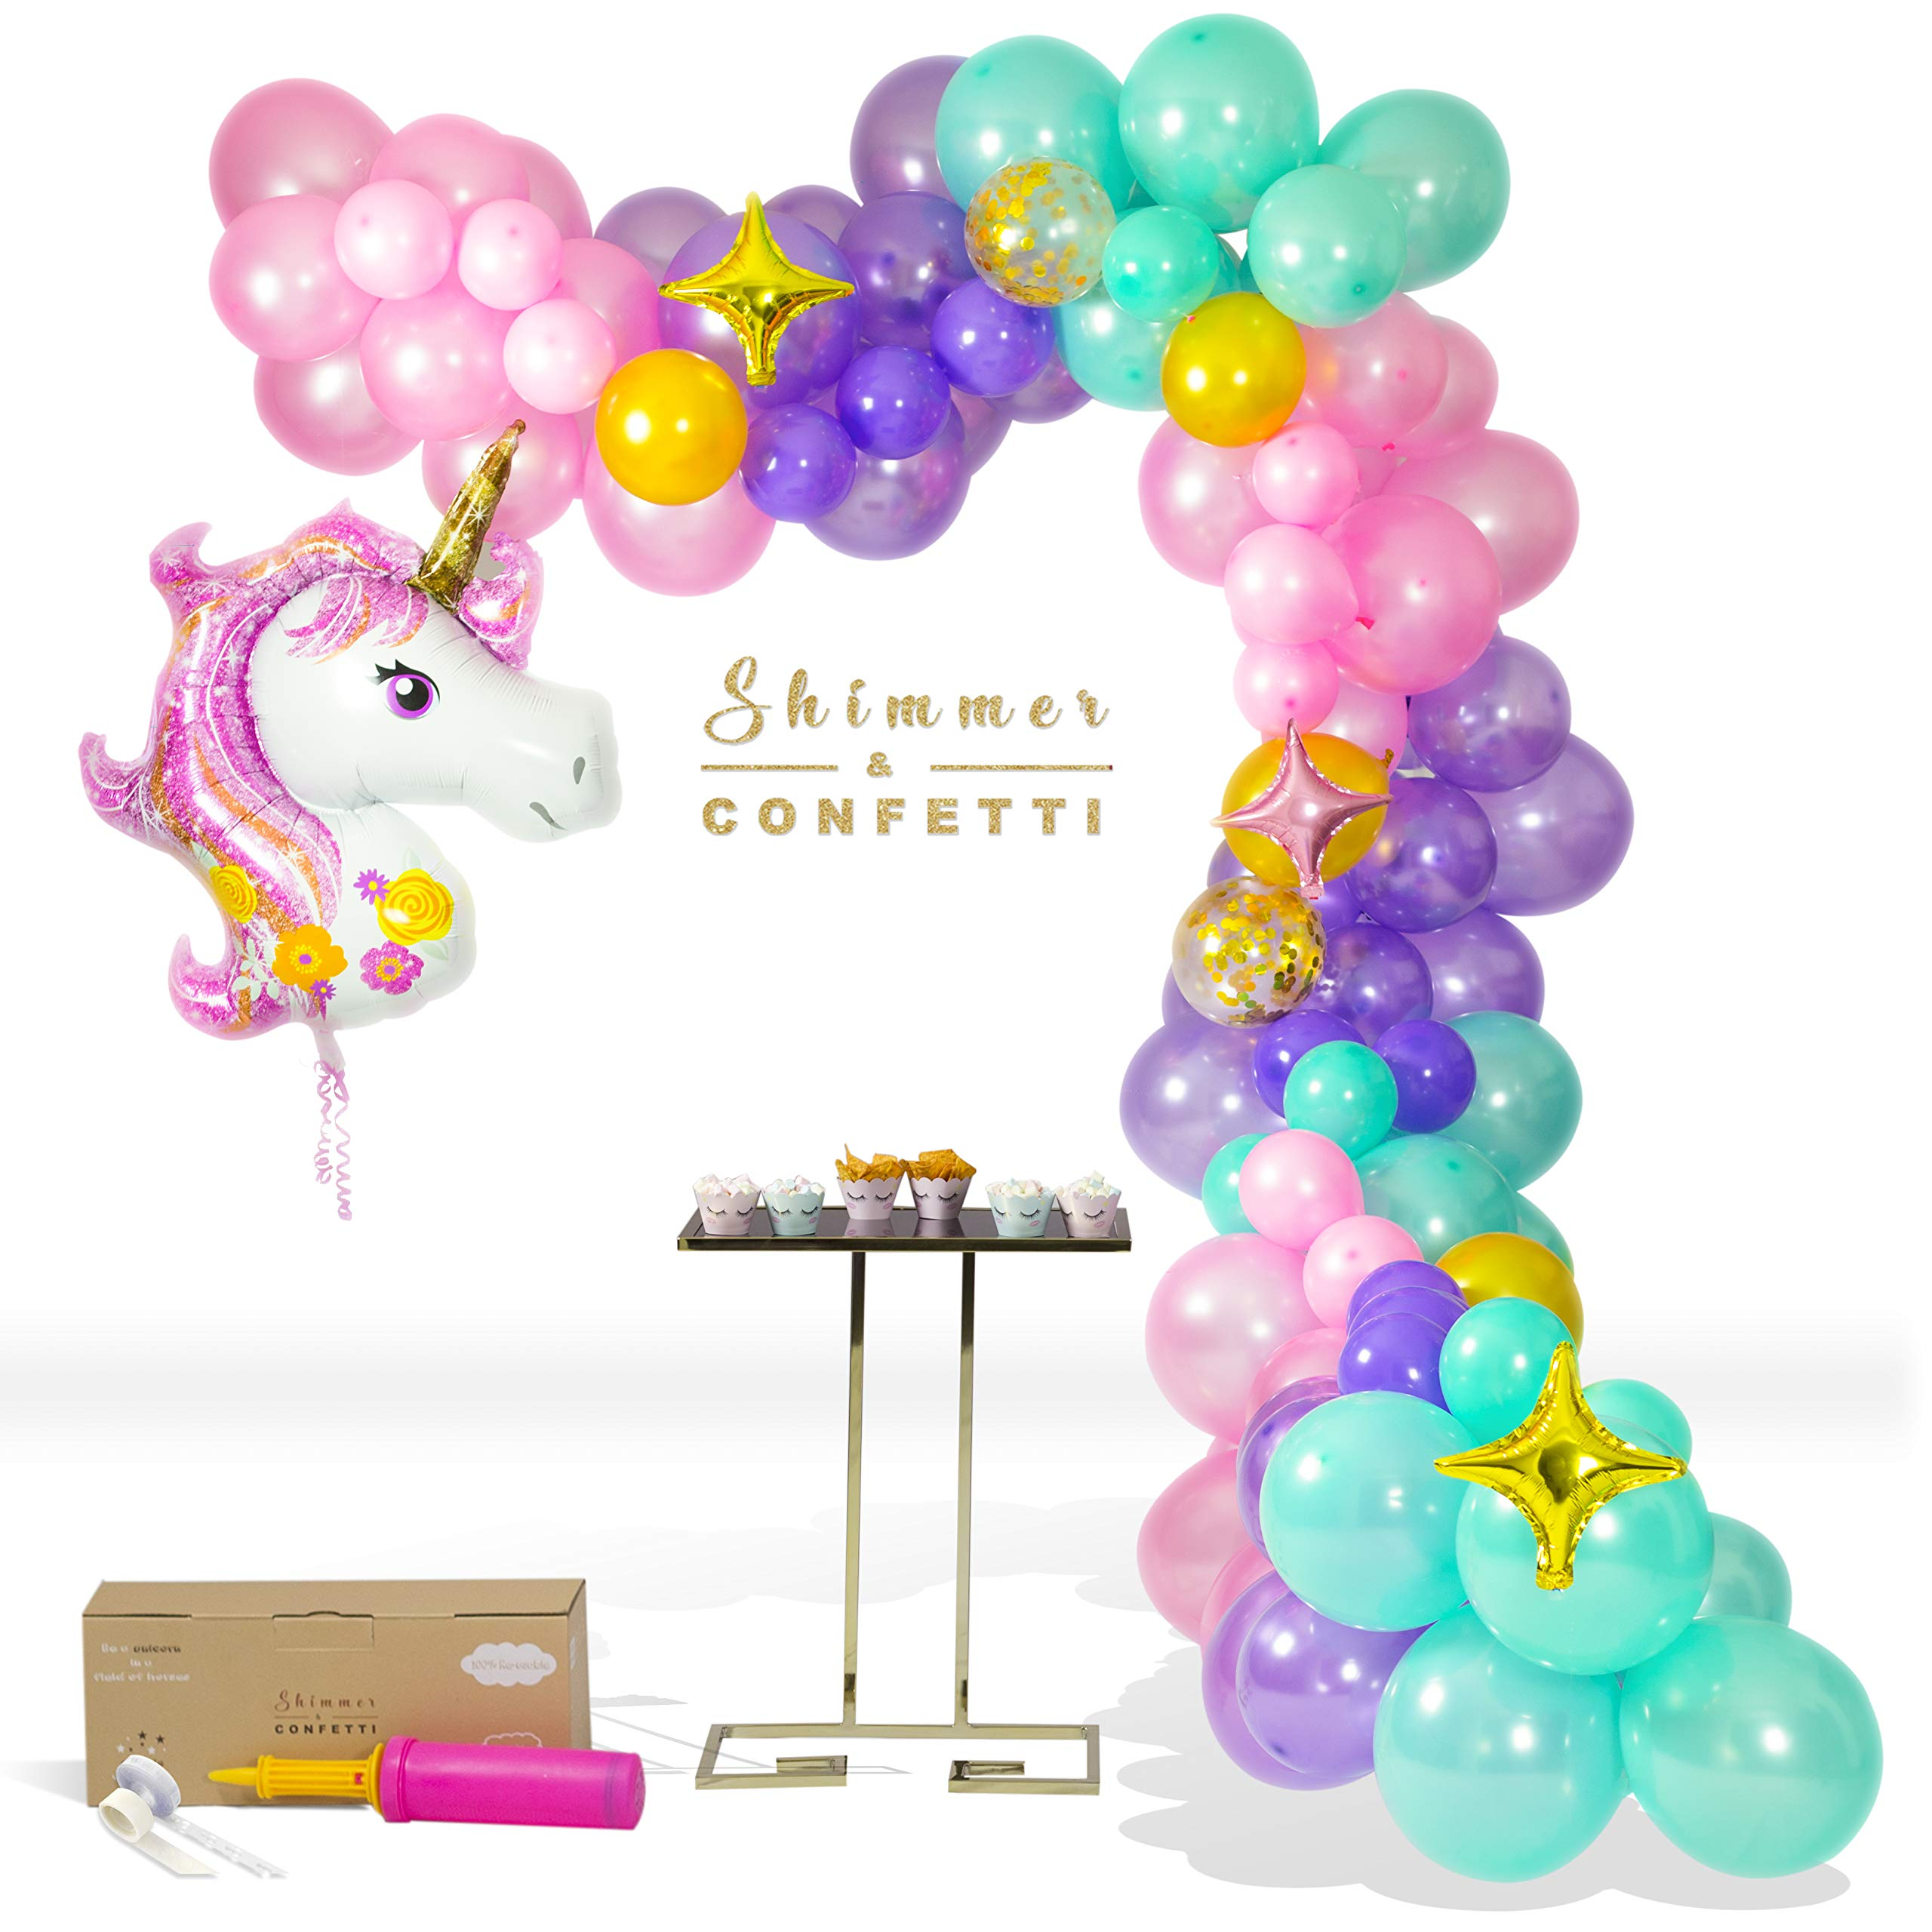 SHIMMER & CONFETTI | Premium 16ft Unicorn Balloon Arch & Garland Kit | Giant Unicorn Balloon, 145 Pink, Purple and Aqua Balloons, 5 Gold Confetti Balloons, 16' Decorating Strip & Pump | Star Balloons